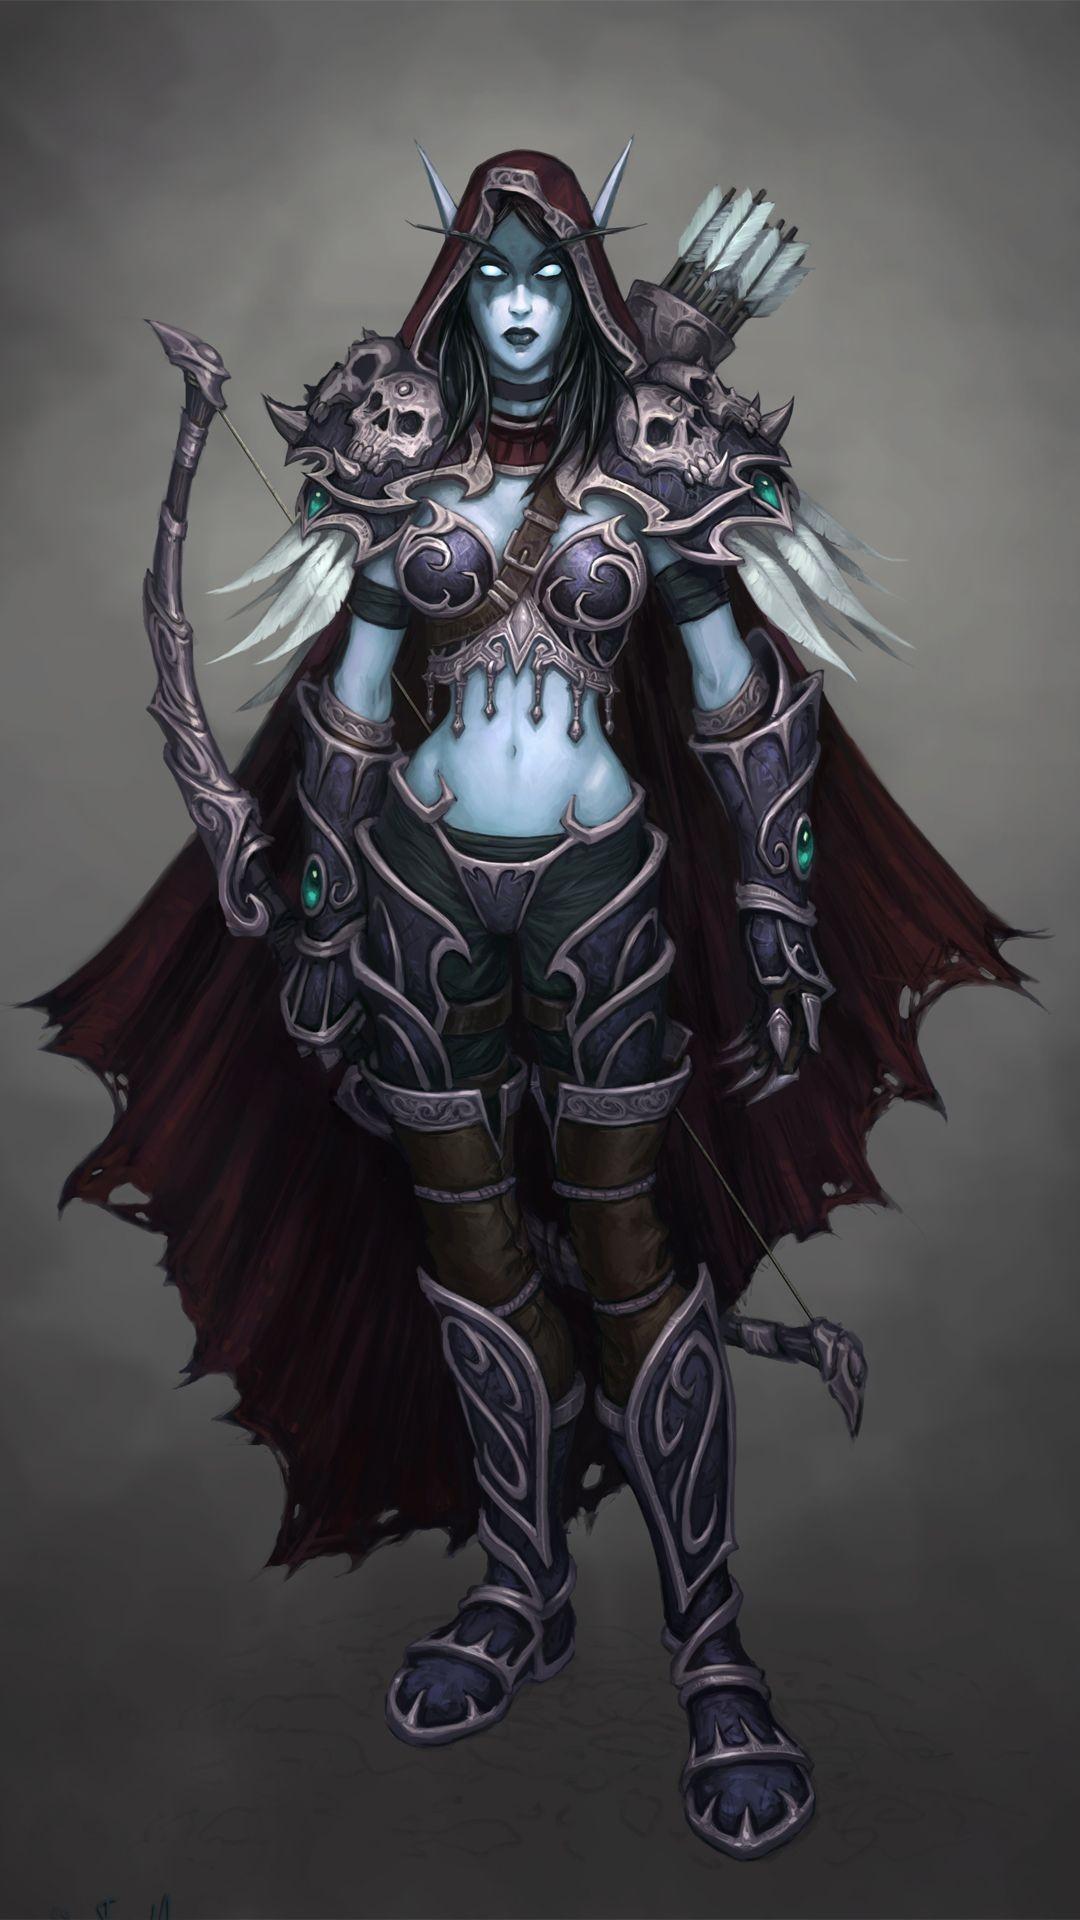 … Sylvanas Windrunner – World of Warcraft Game mobile wallpaper